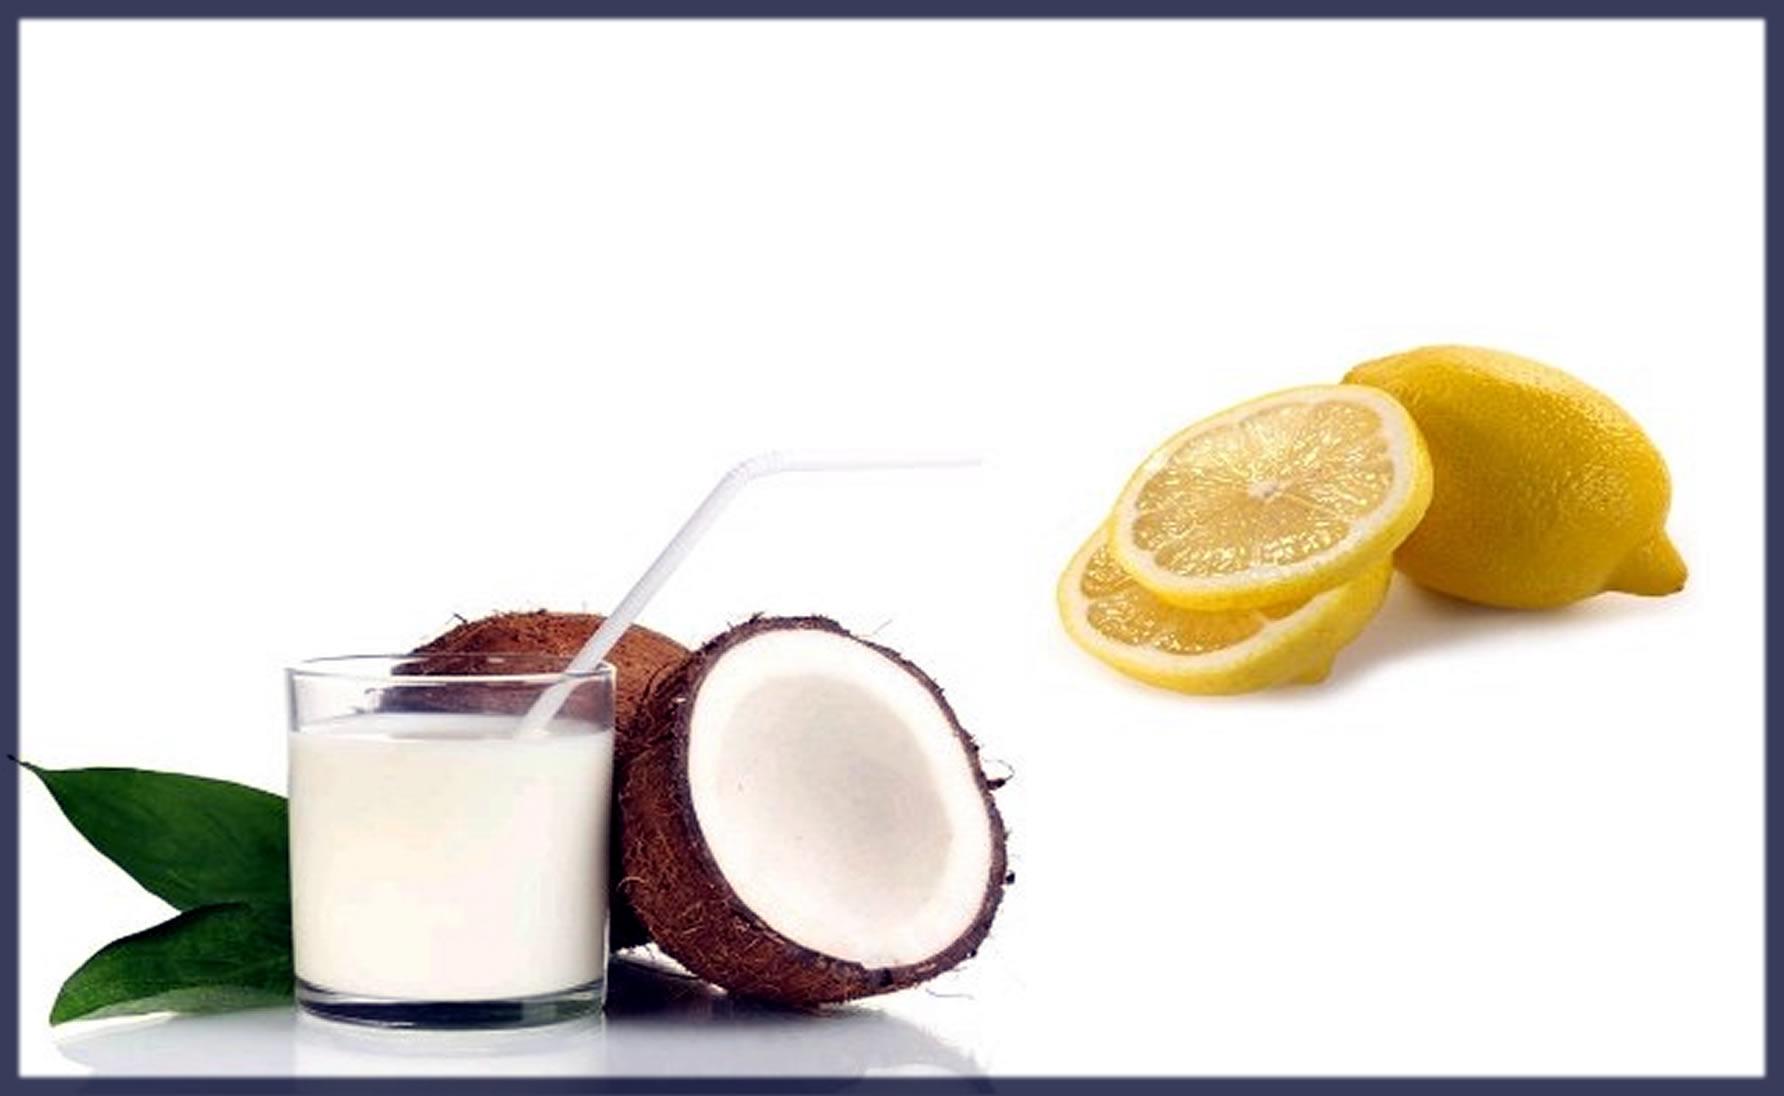 Milk, Lemon Juice And Coconut